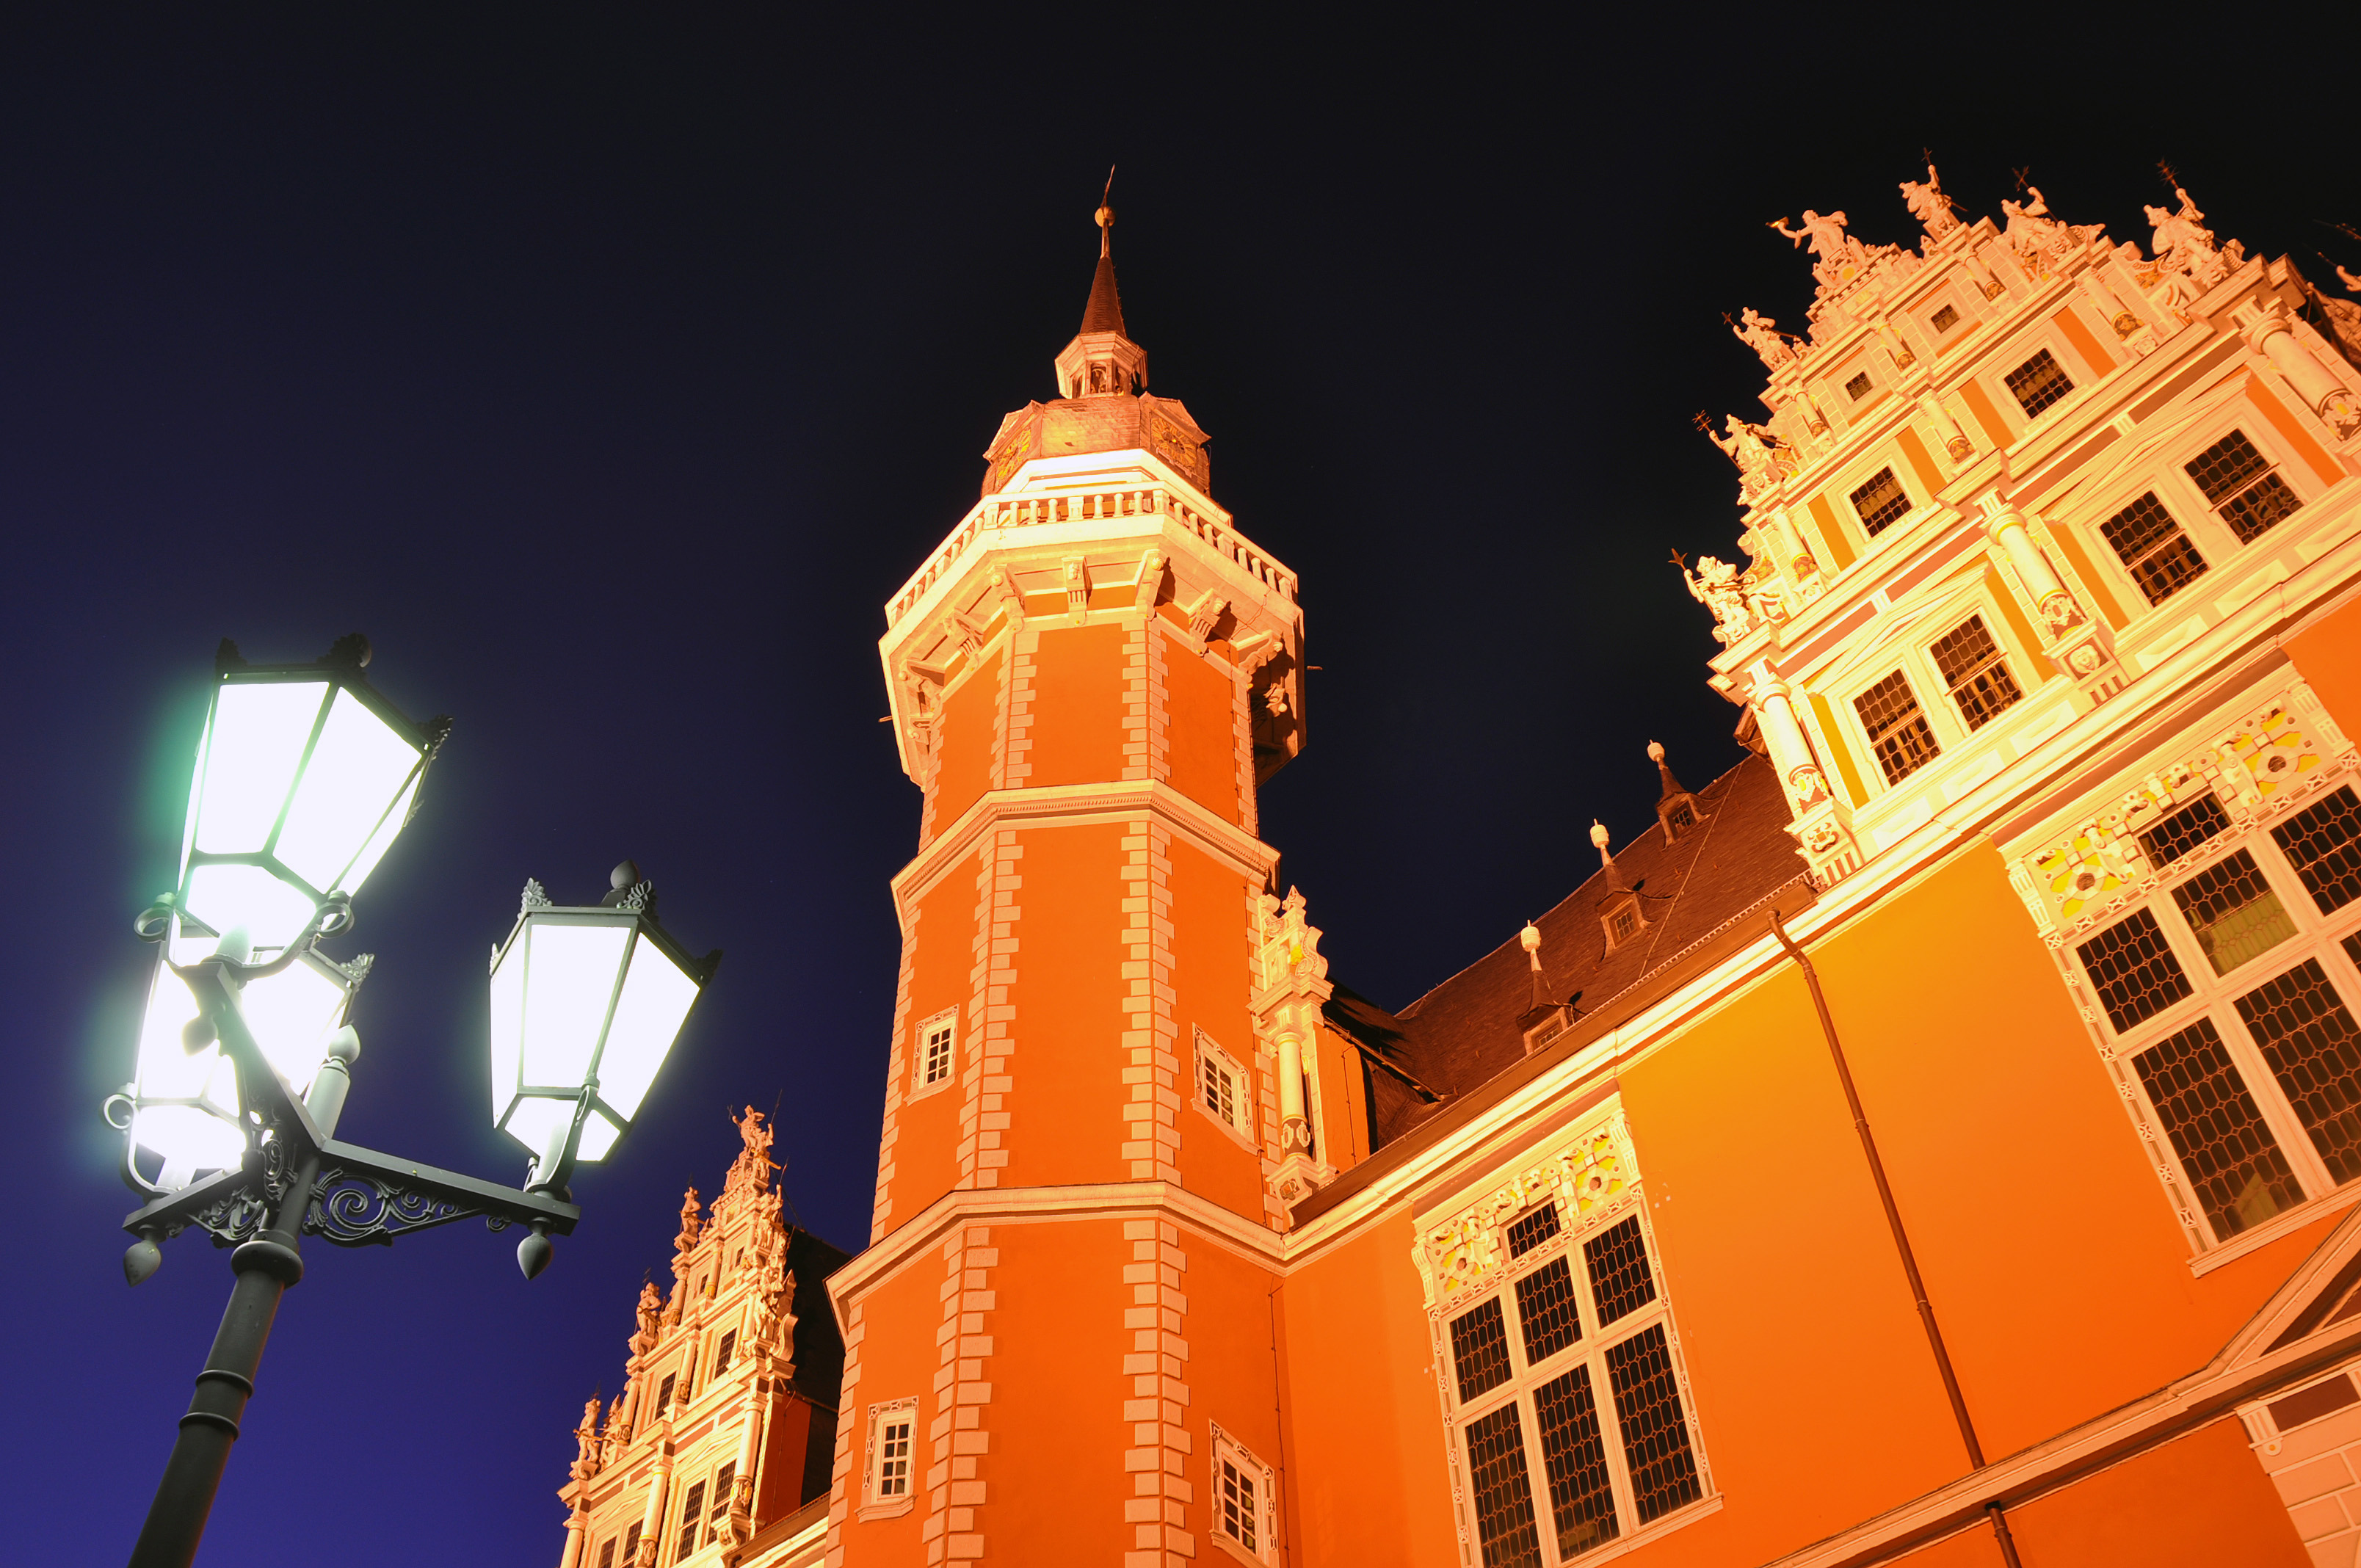 Juleum Helmstedt